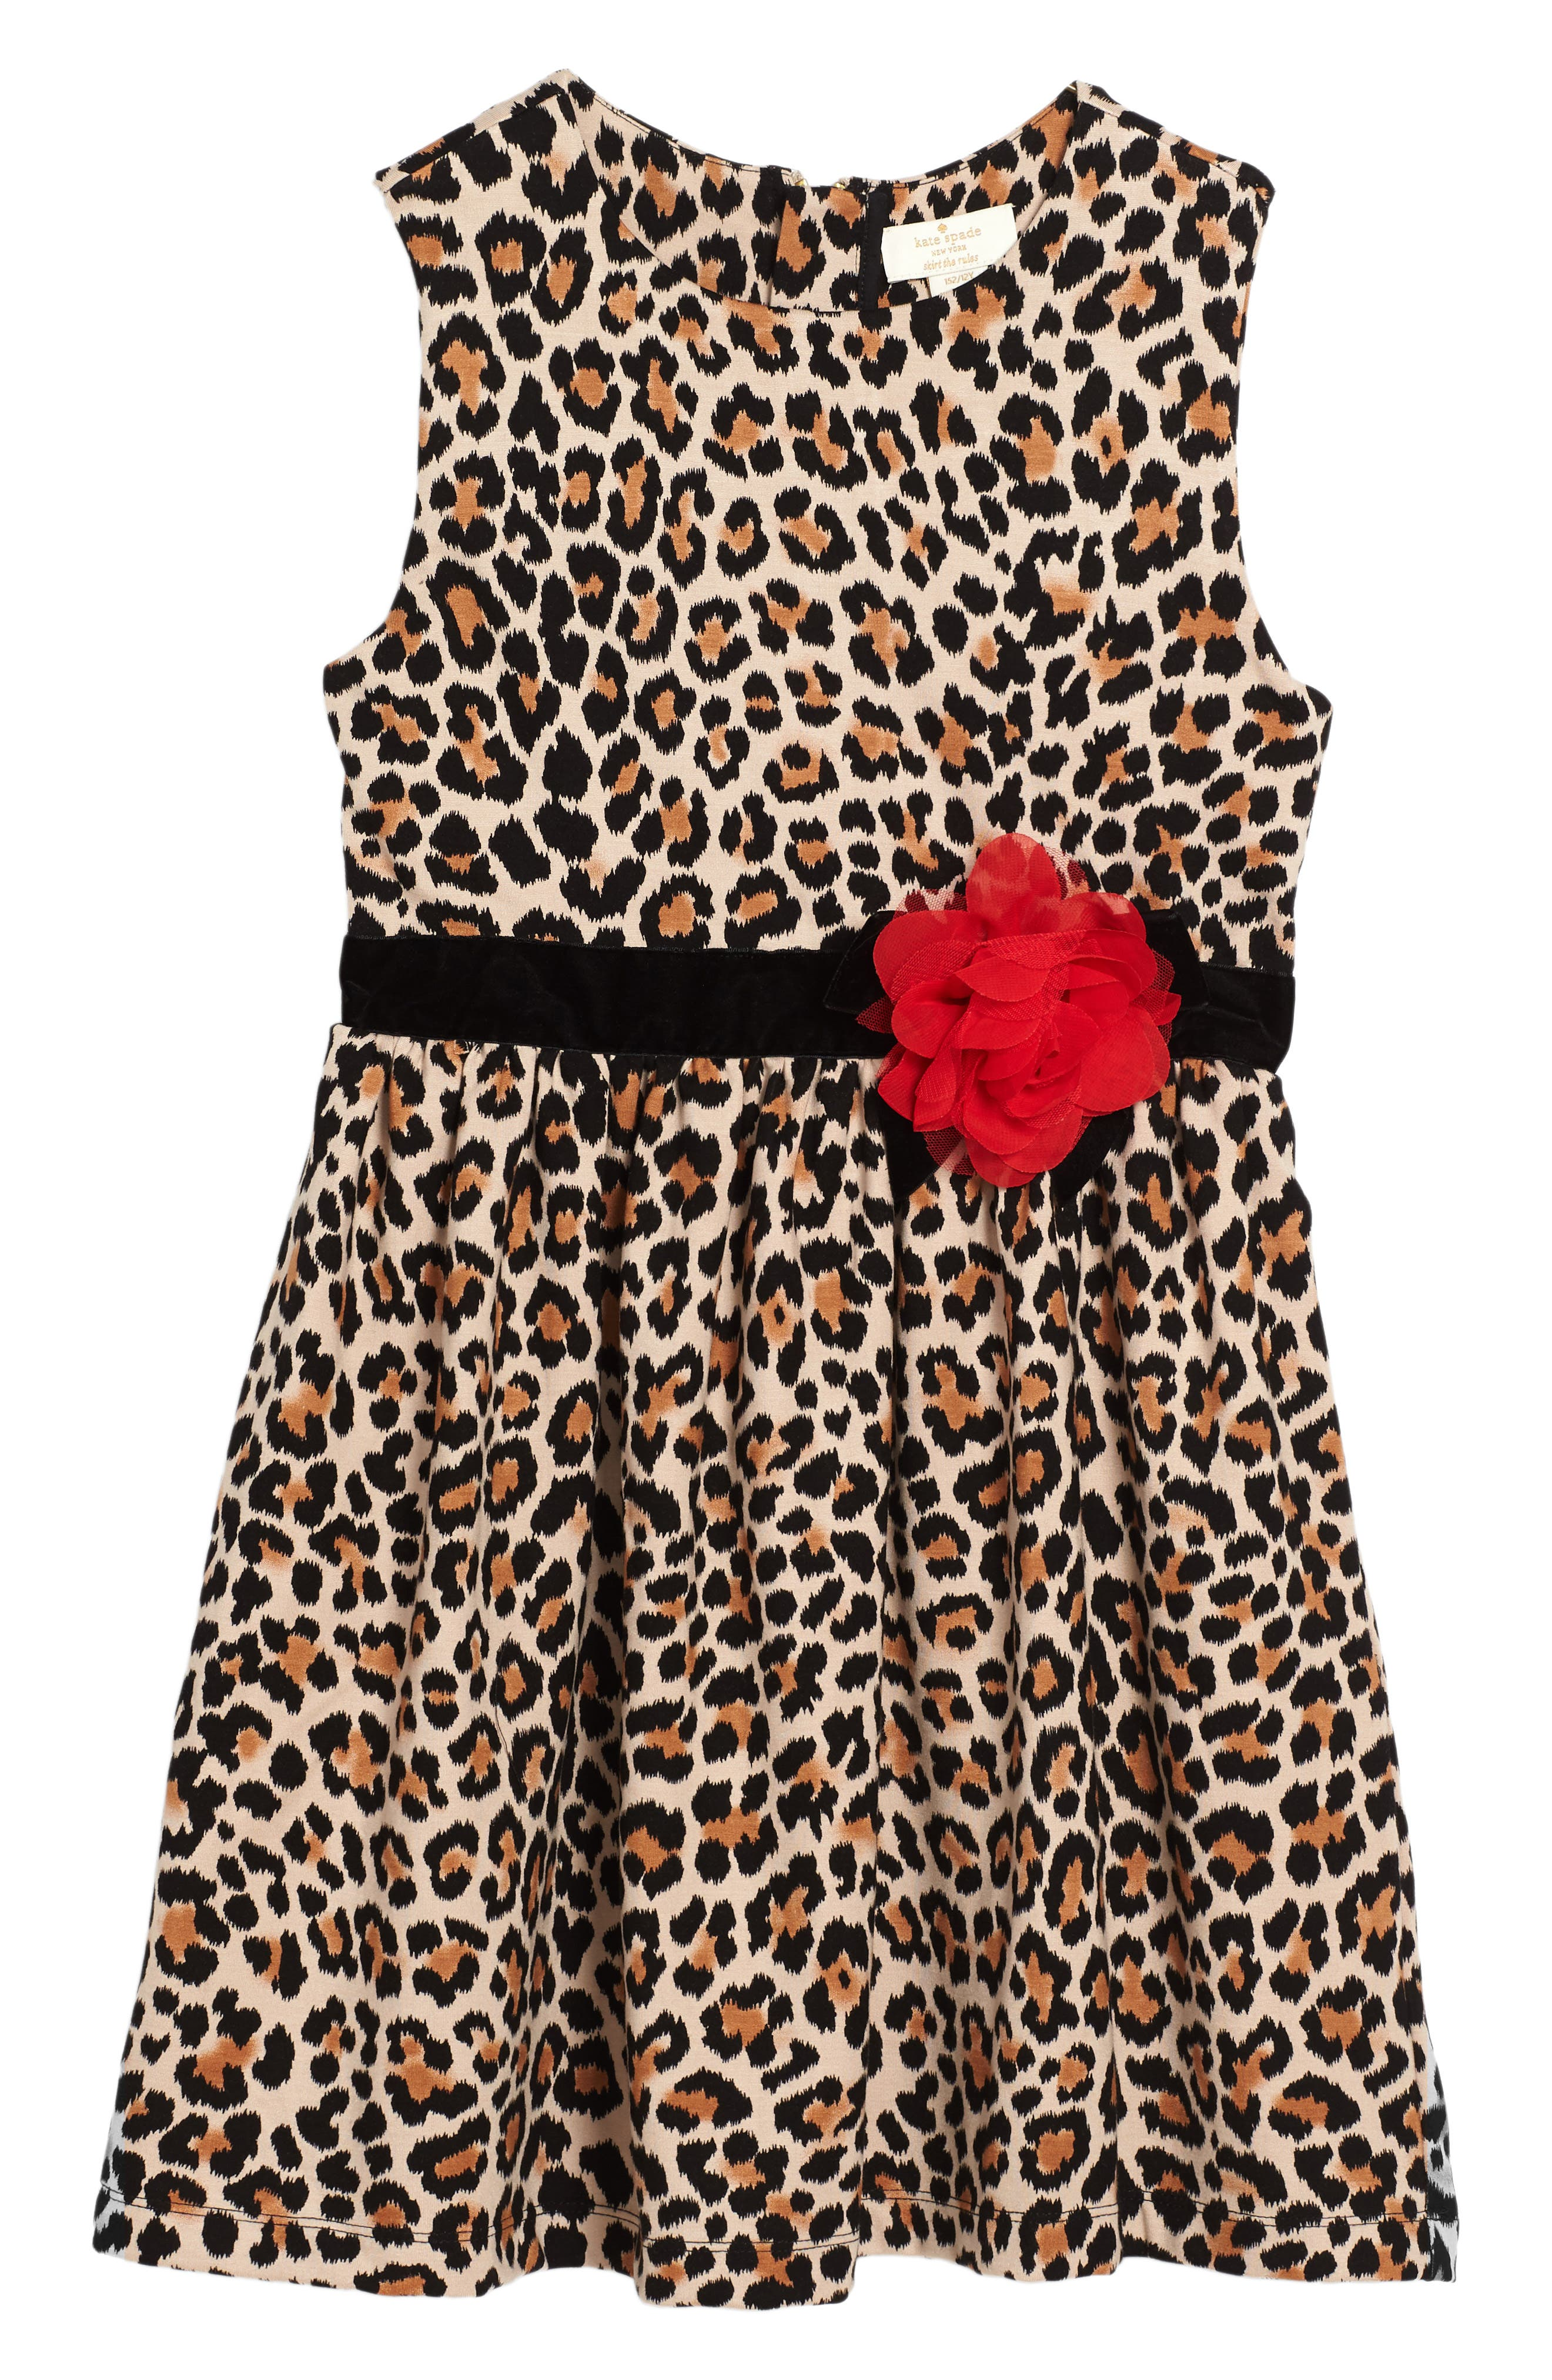 Main Image - kate spade new york leopard print dress (Toddler Girls & Little Girls)